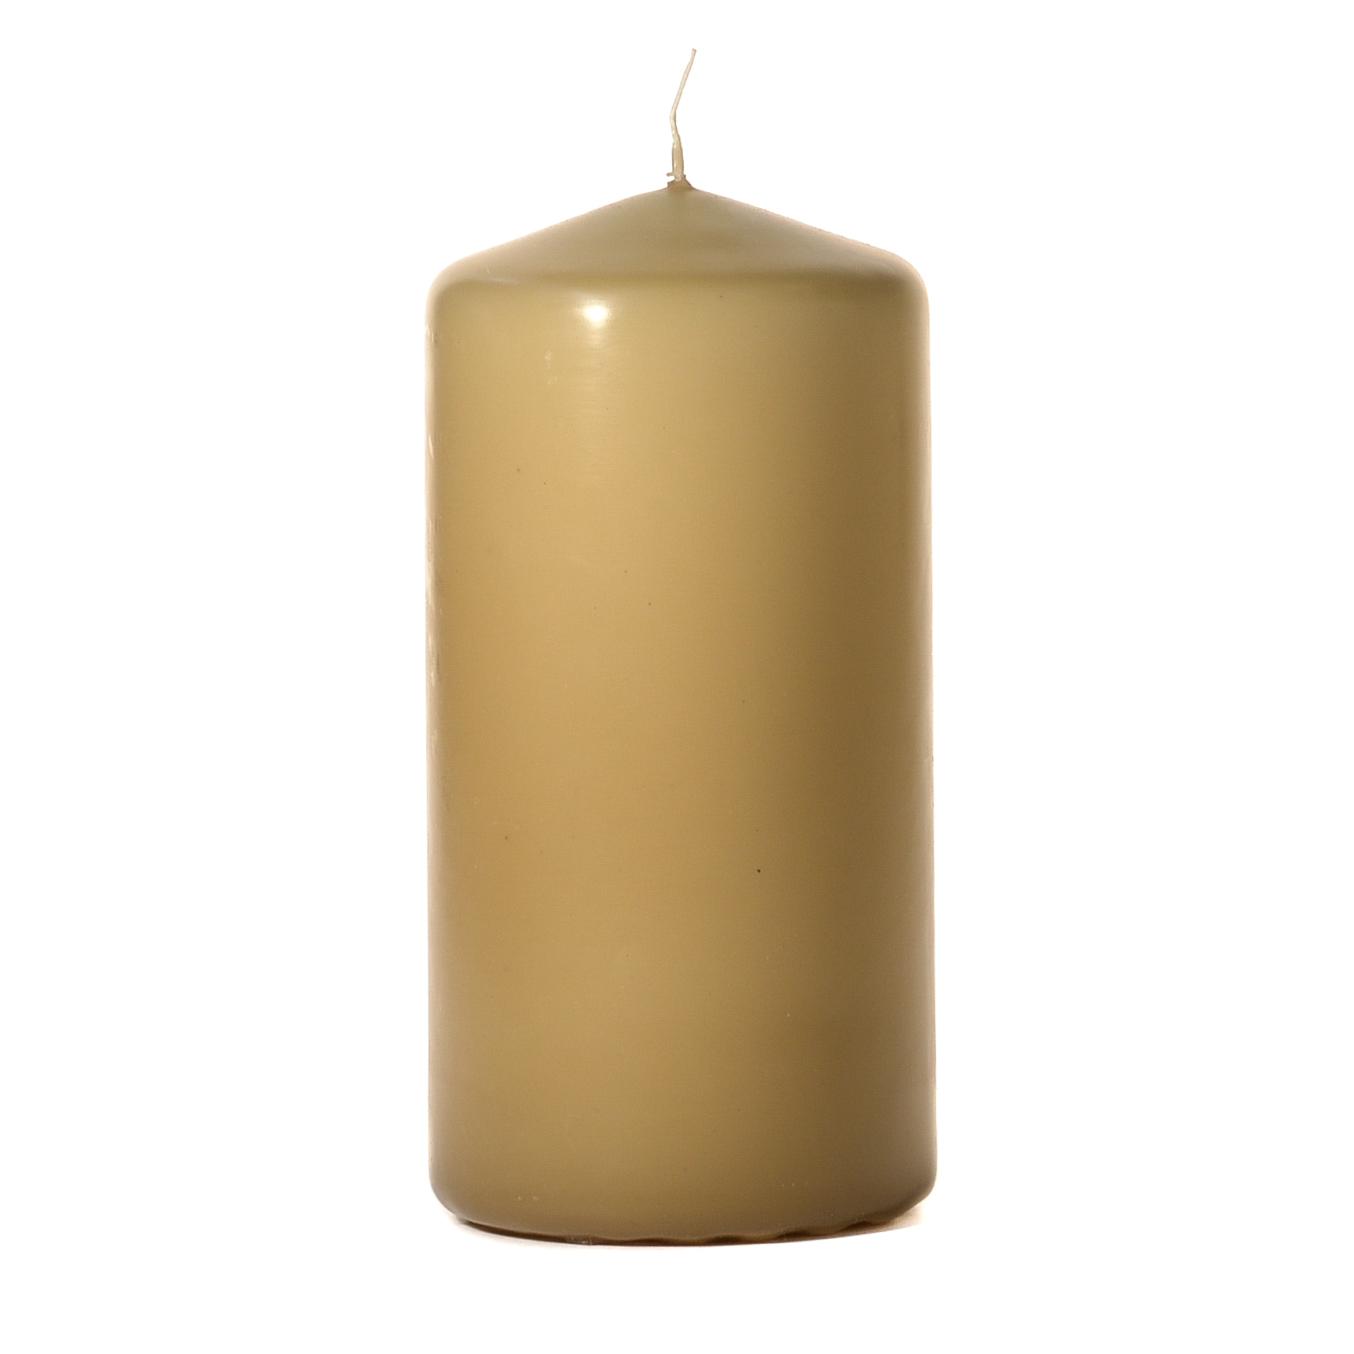 3x6 Parchment Pillar Candles Unscented